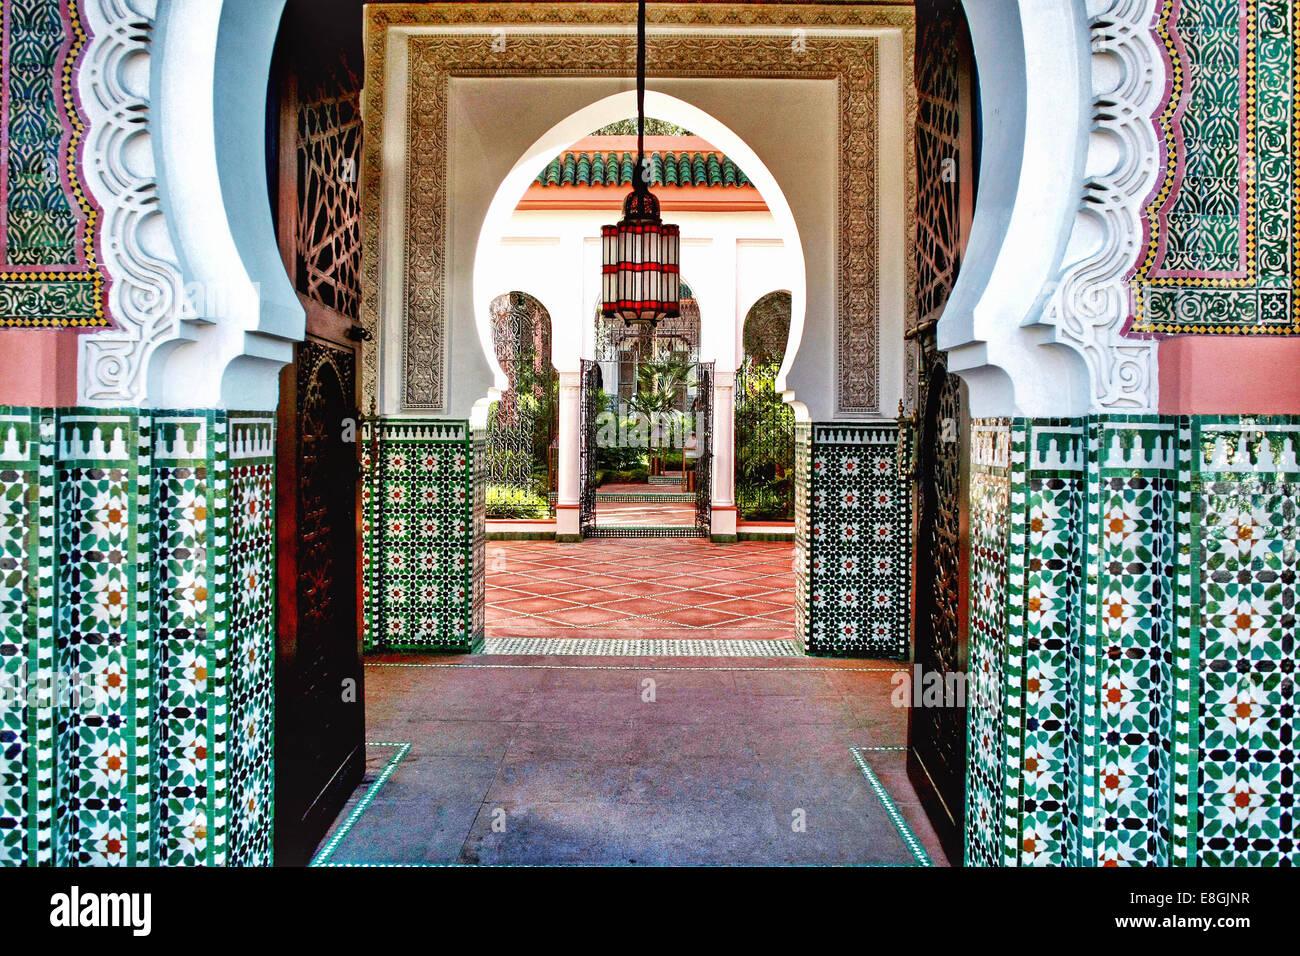 Morocco, Marrakesh-Tensift-El Haouz, Province Marrakesh, Marrakesh, Hotel interior with archway - Stock Image